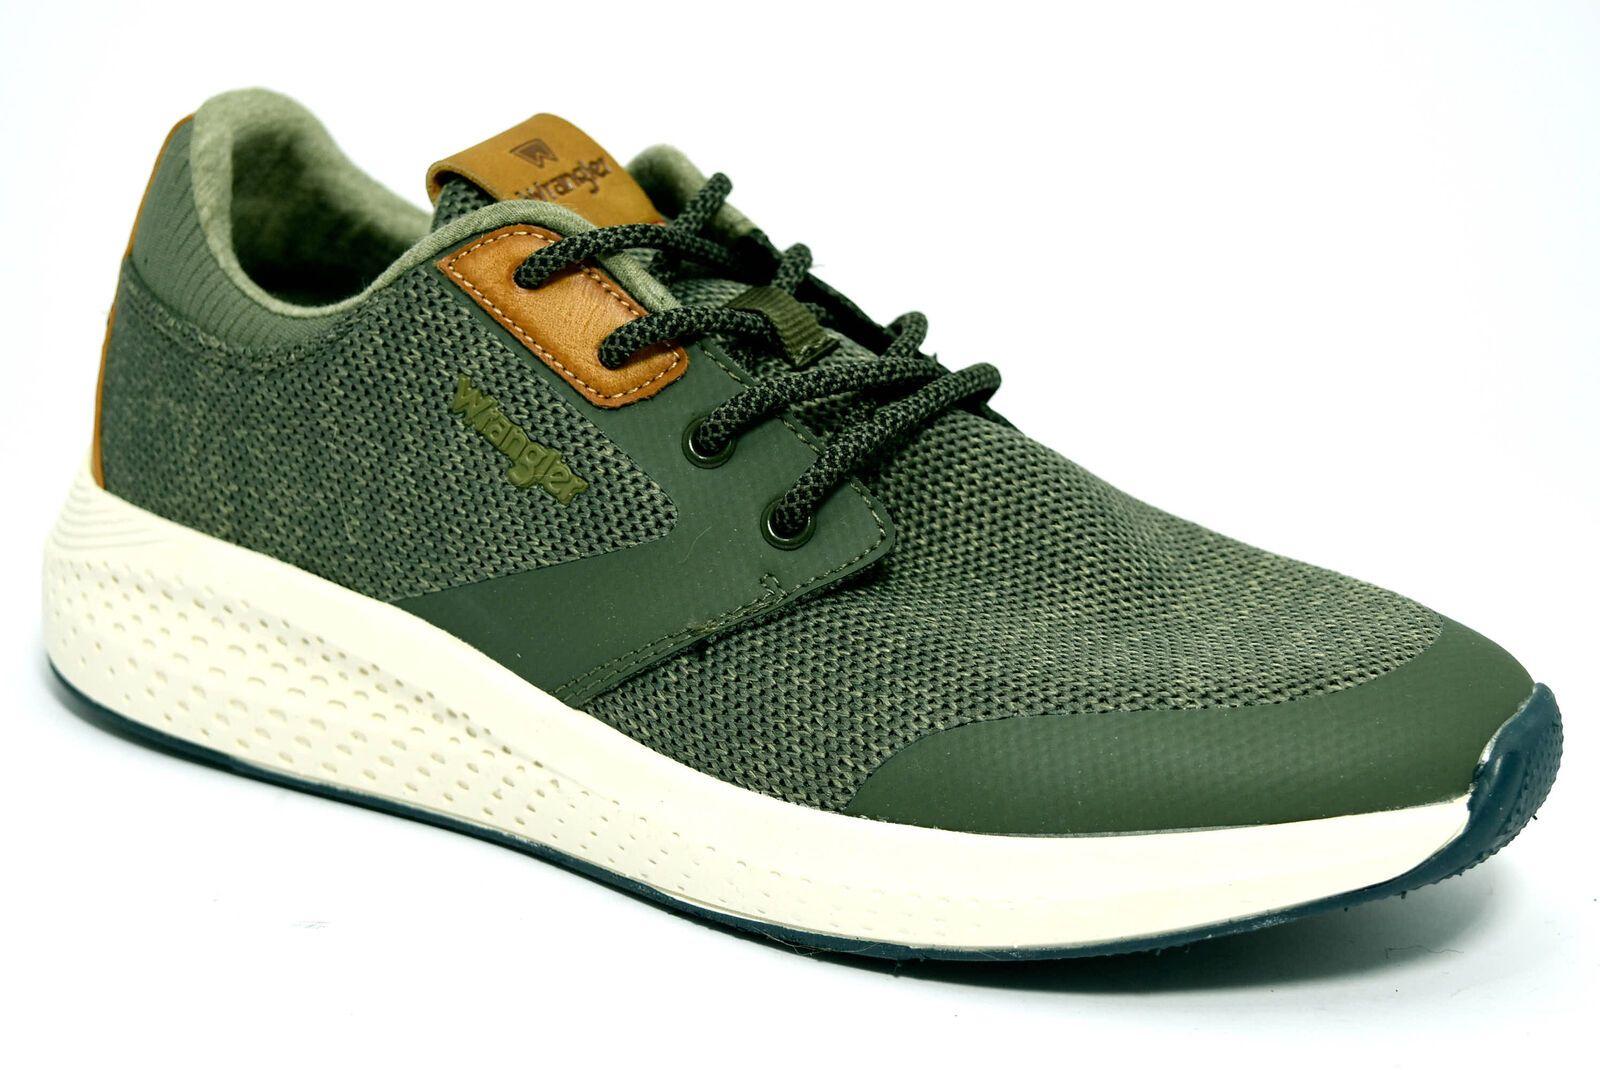 WRANGLER WM91060A 020 MILITARY Scarpe Sneaker Uomo Stringhe